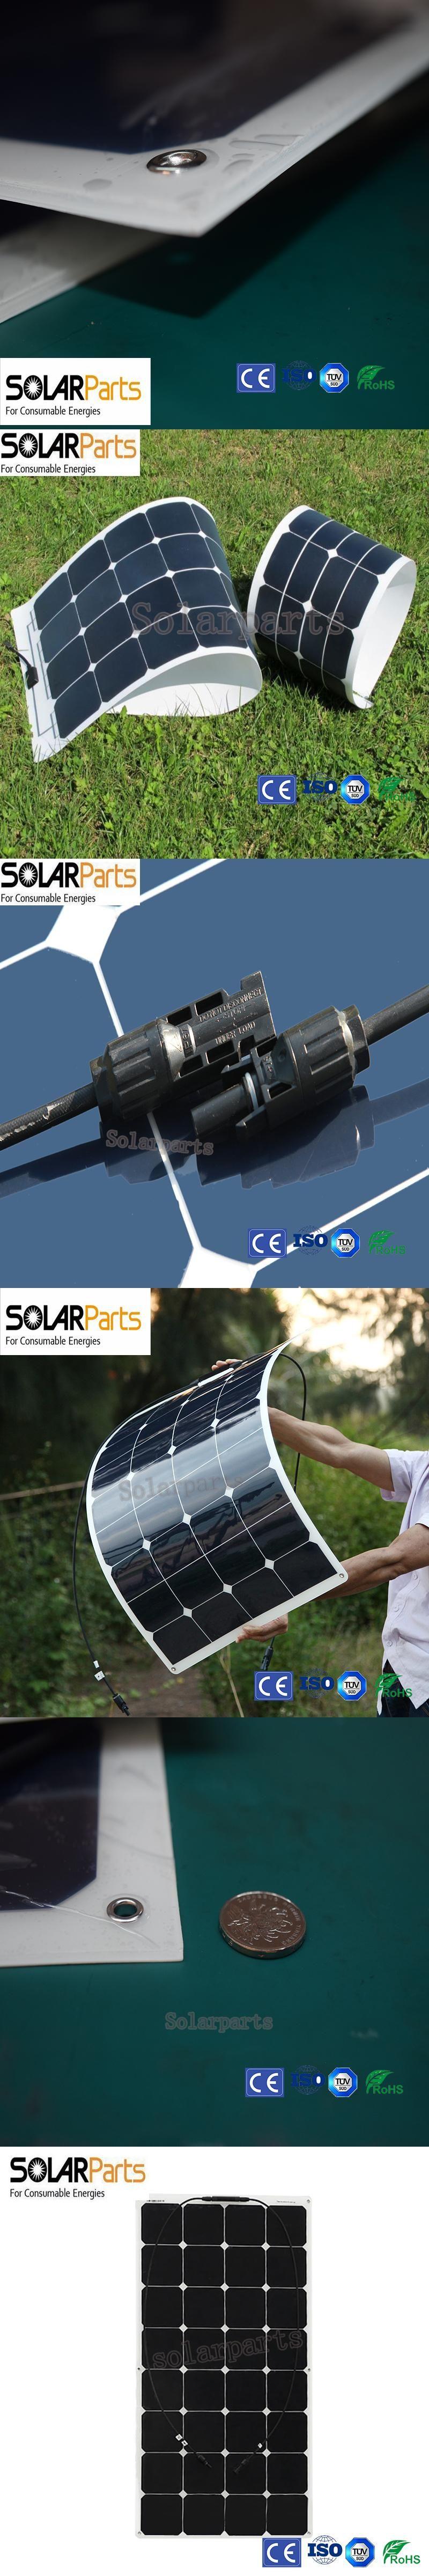 solarparts 1pcsx100w factory cheap 12v flexible pv solar panel cell